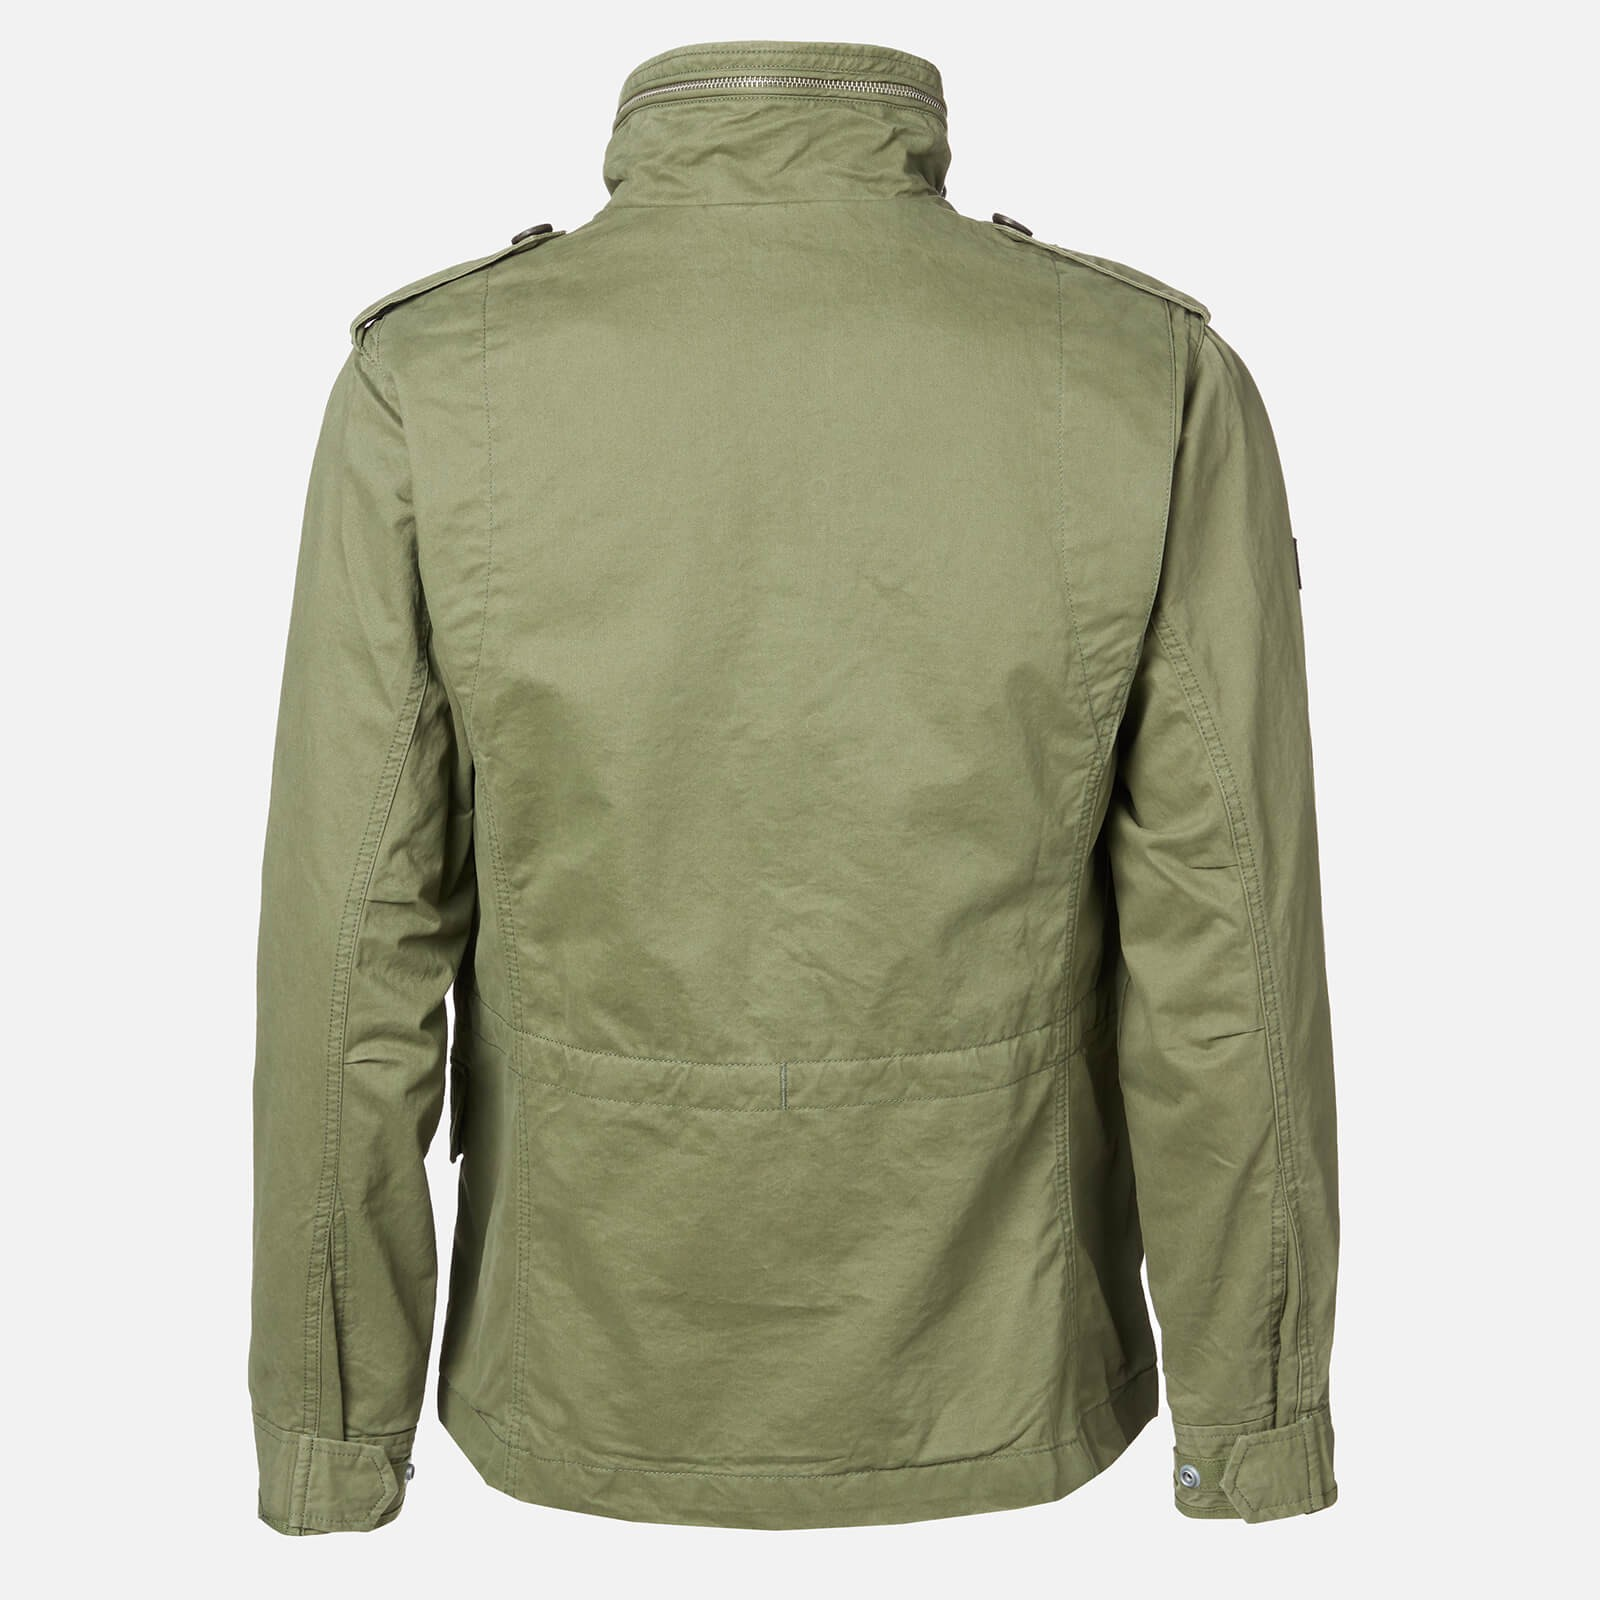 Superdry 极度干燥 男士工装风运动夹克